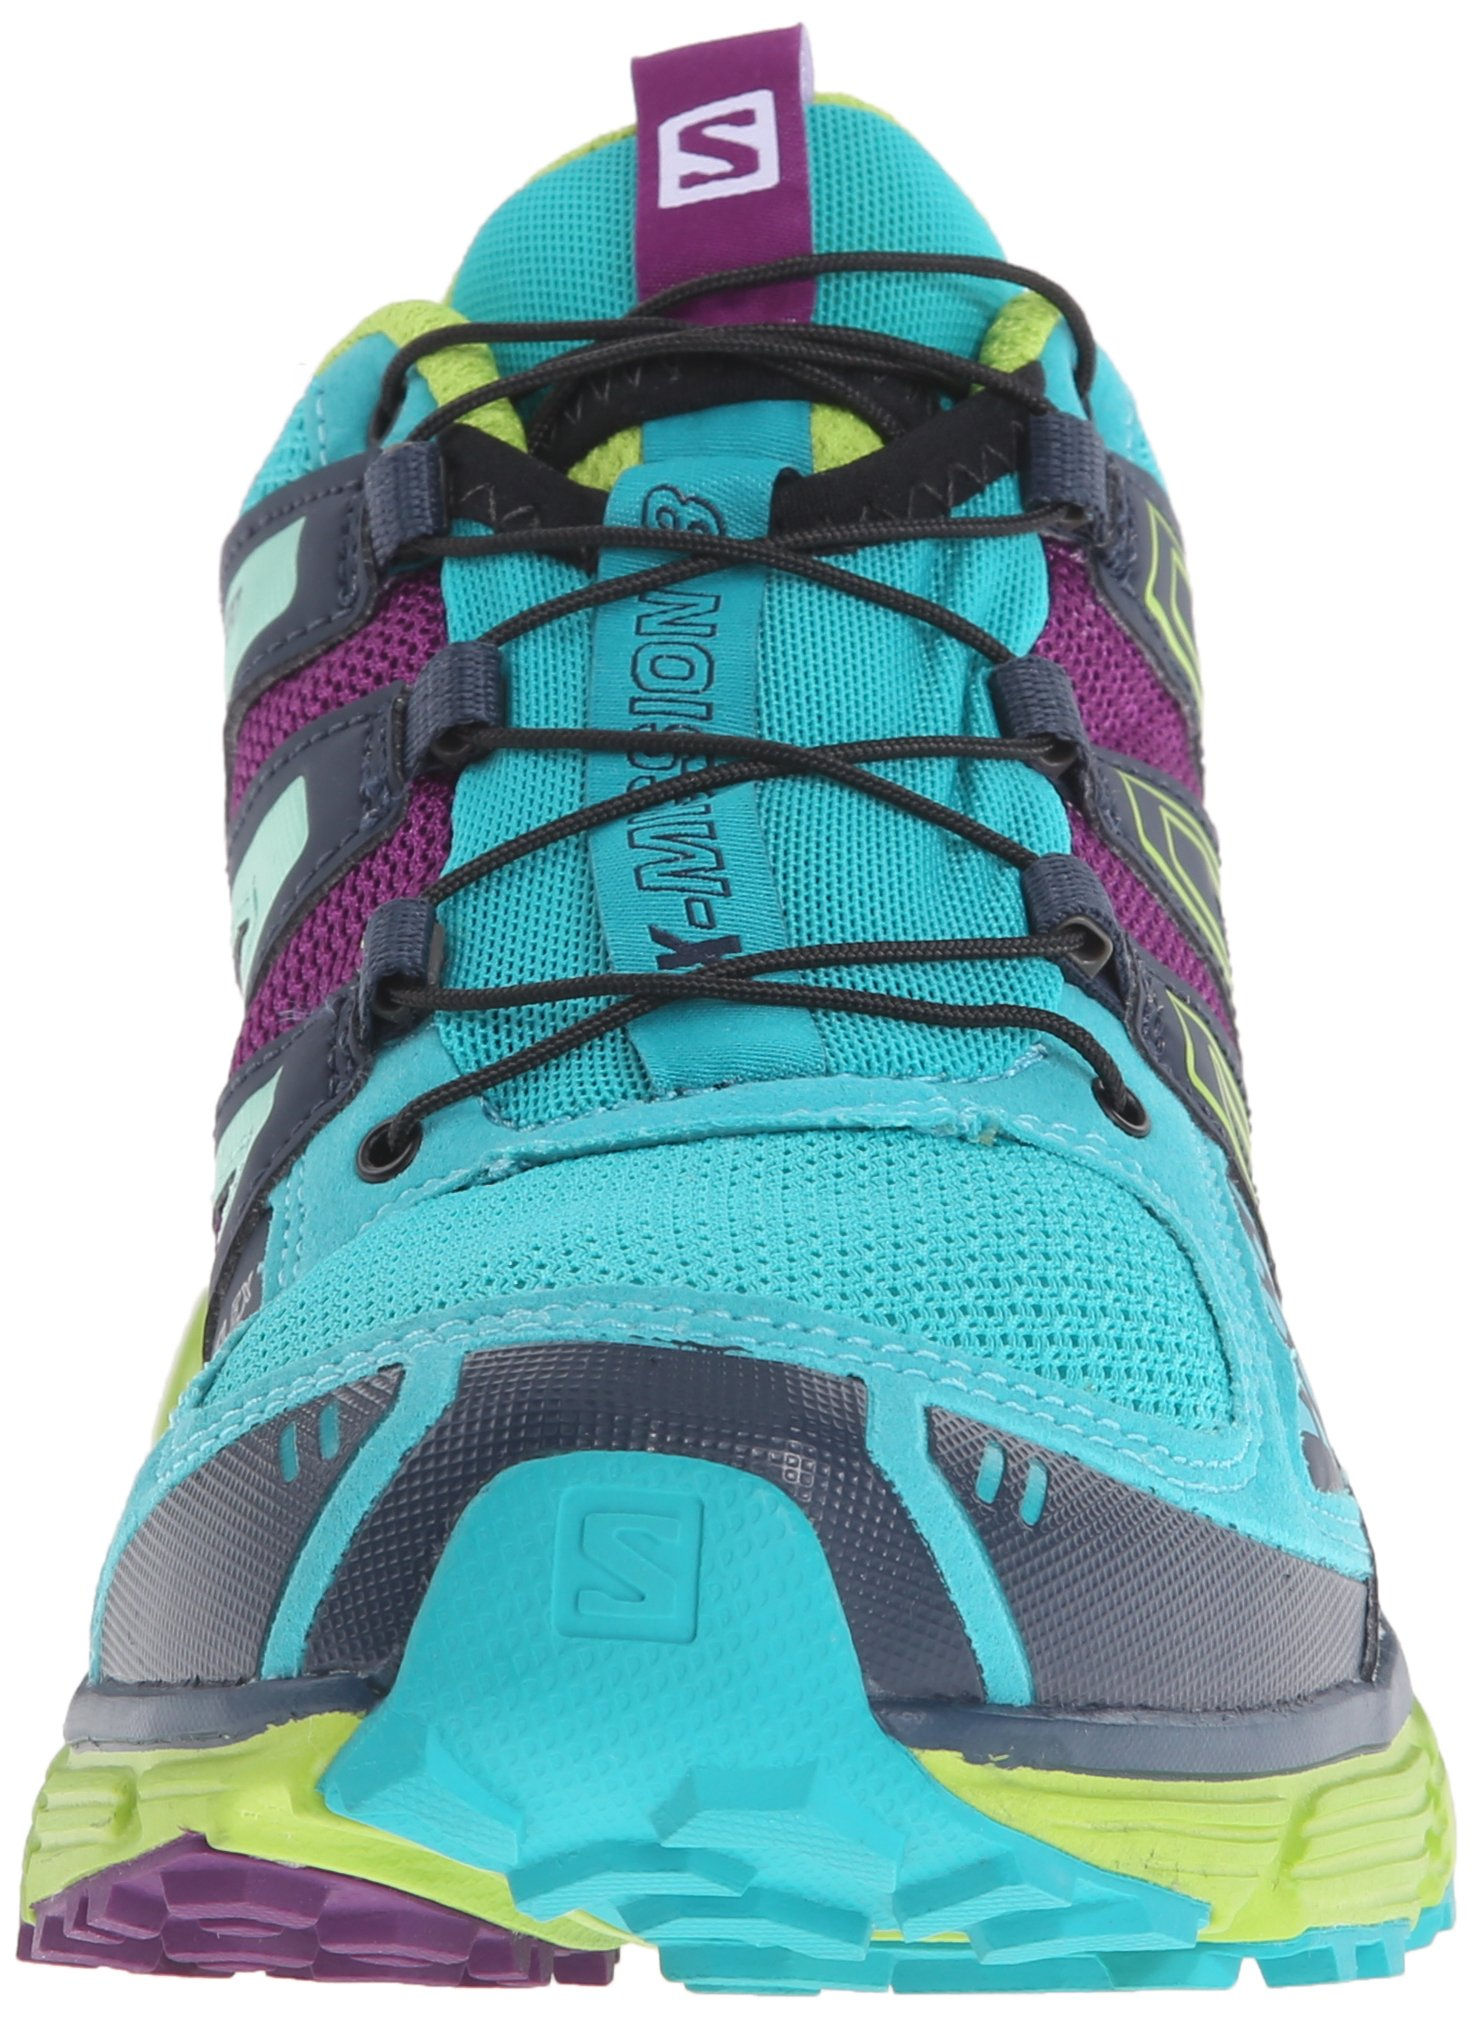 Salomon Women's X-Mission 3 W Trail Running Shoe, Teal Blue/Granny Green/Passion Purple, 7.5 B US by Salomon (Image #4)